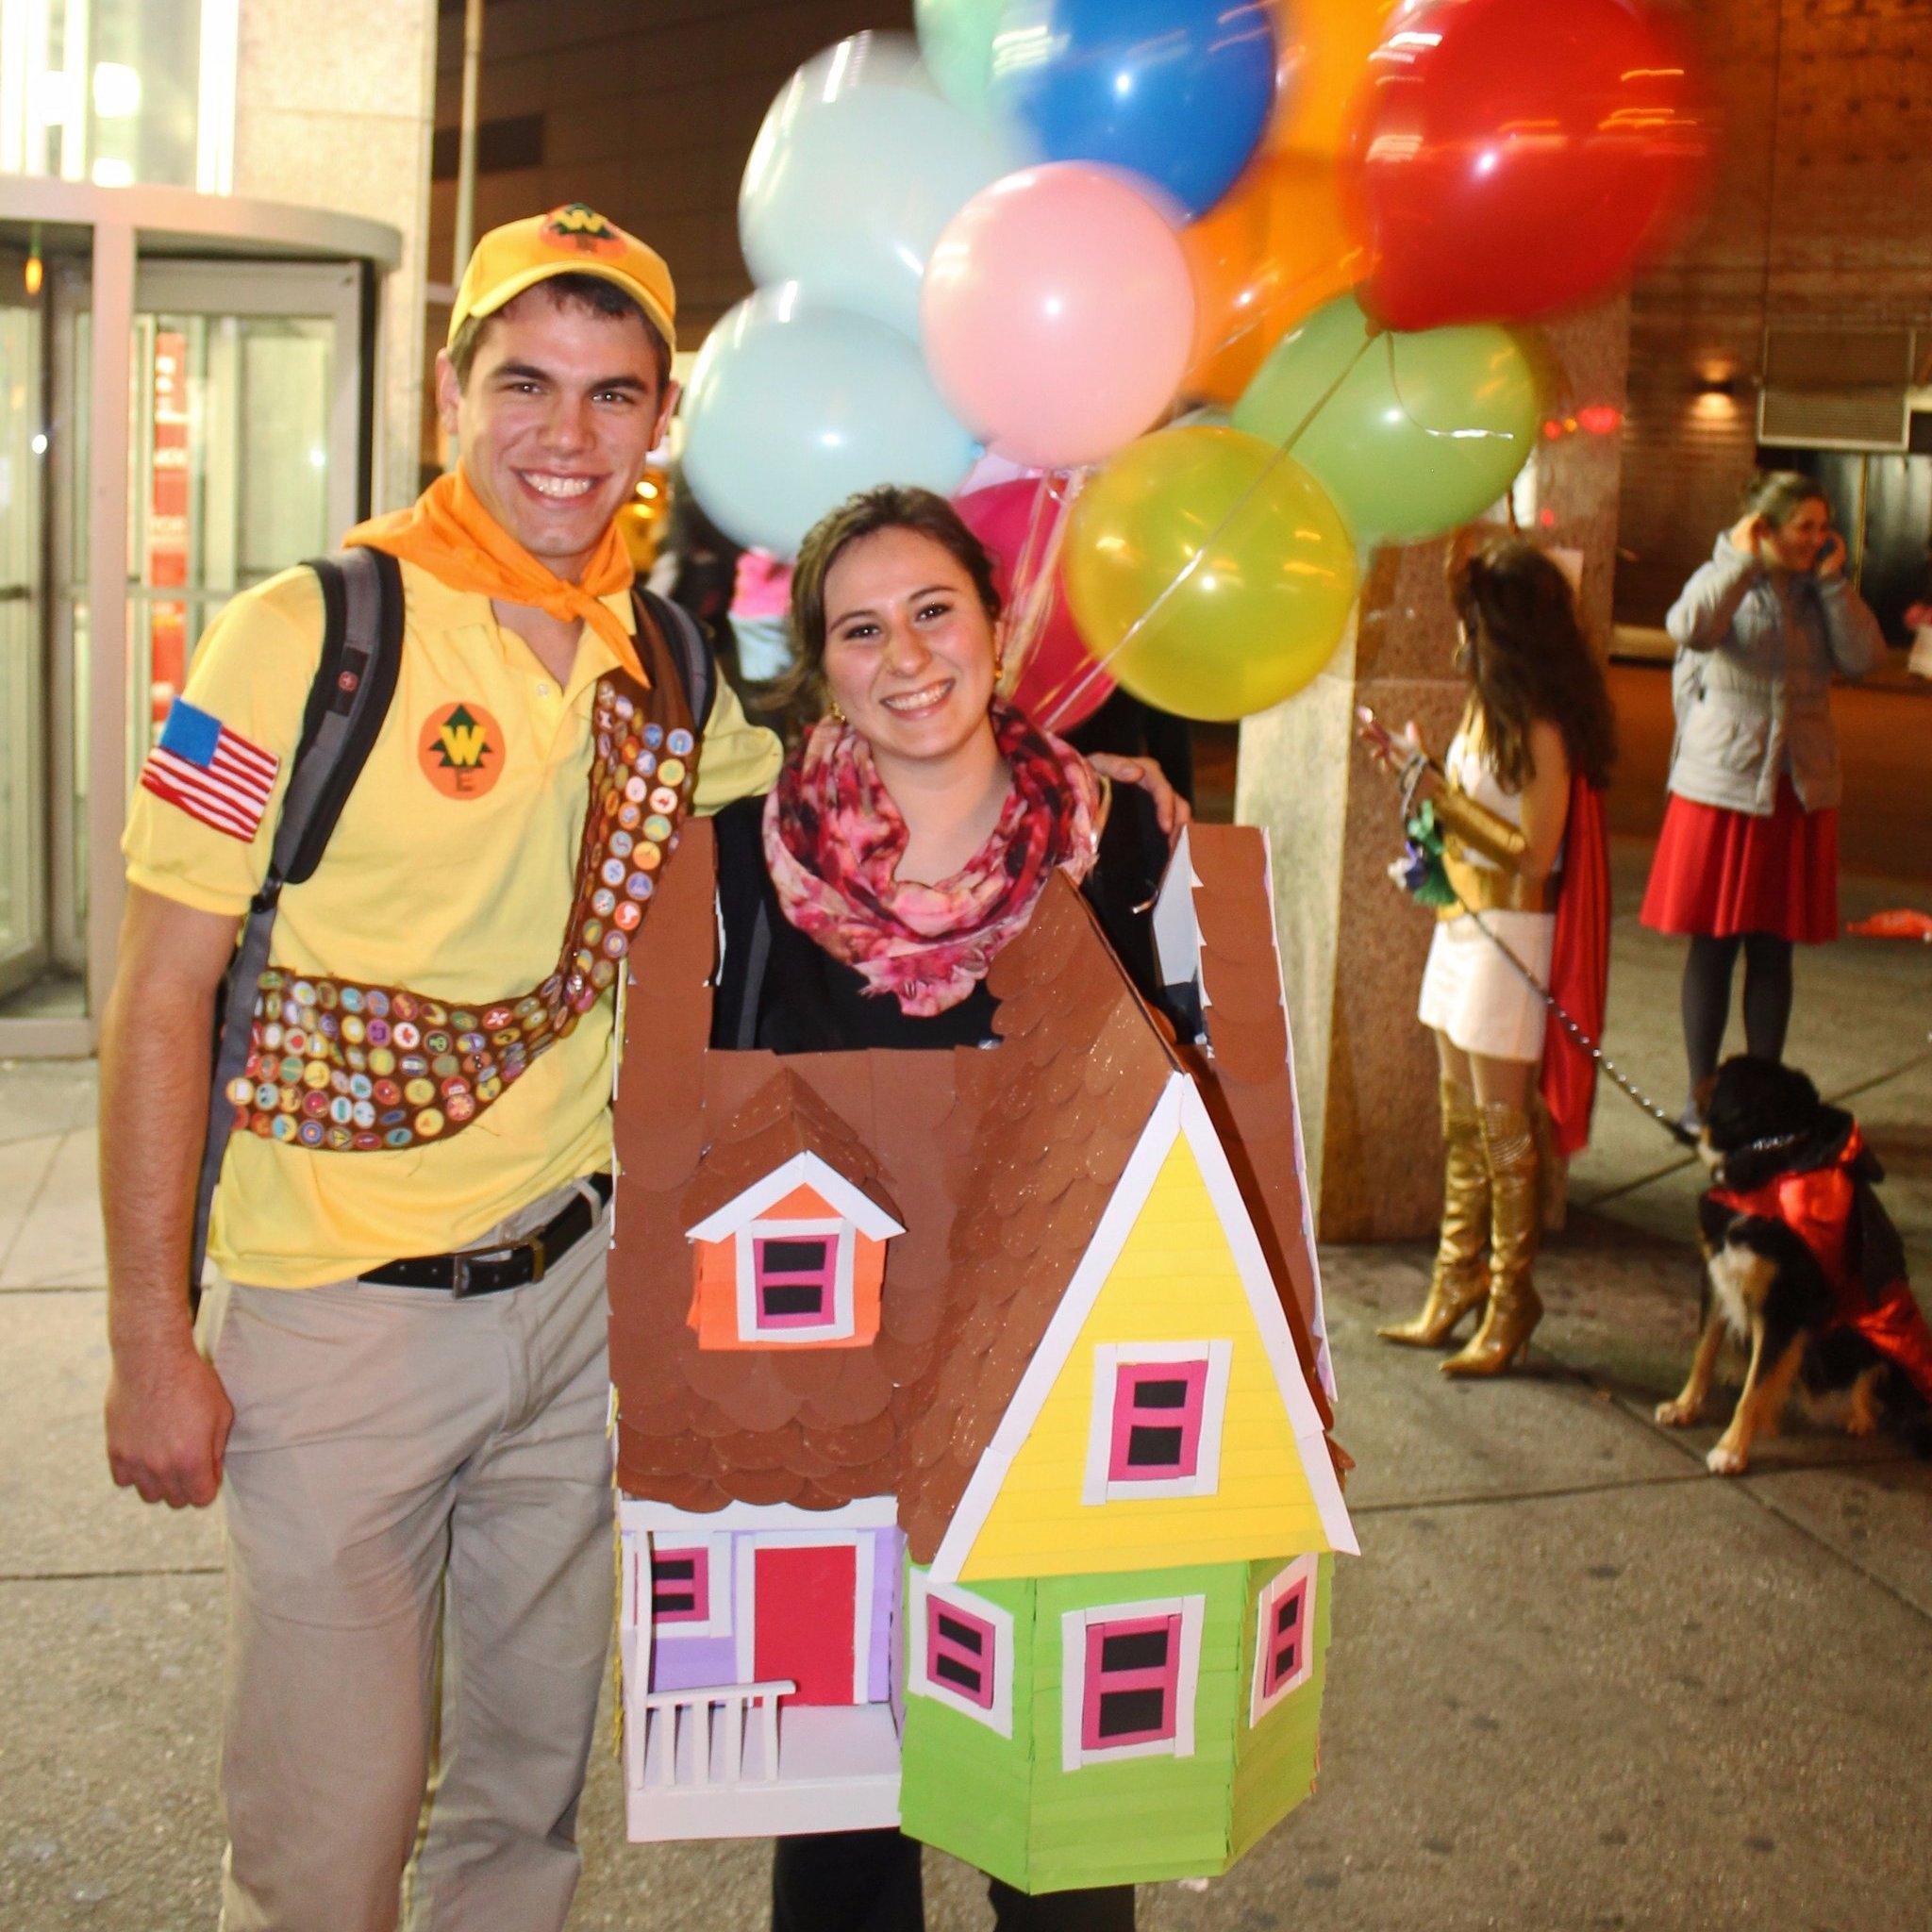 10 Unique Homemade Costume Ideas For Couples cheap diy couples halloween costumes popsugar smart living 31